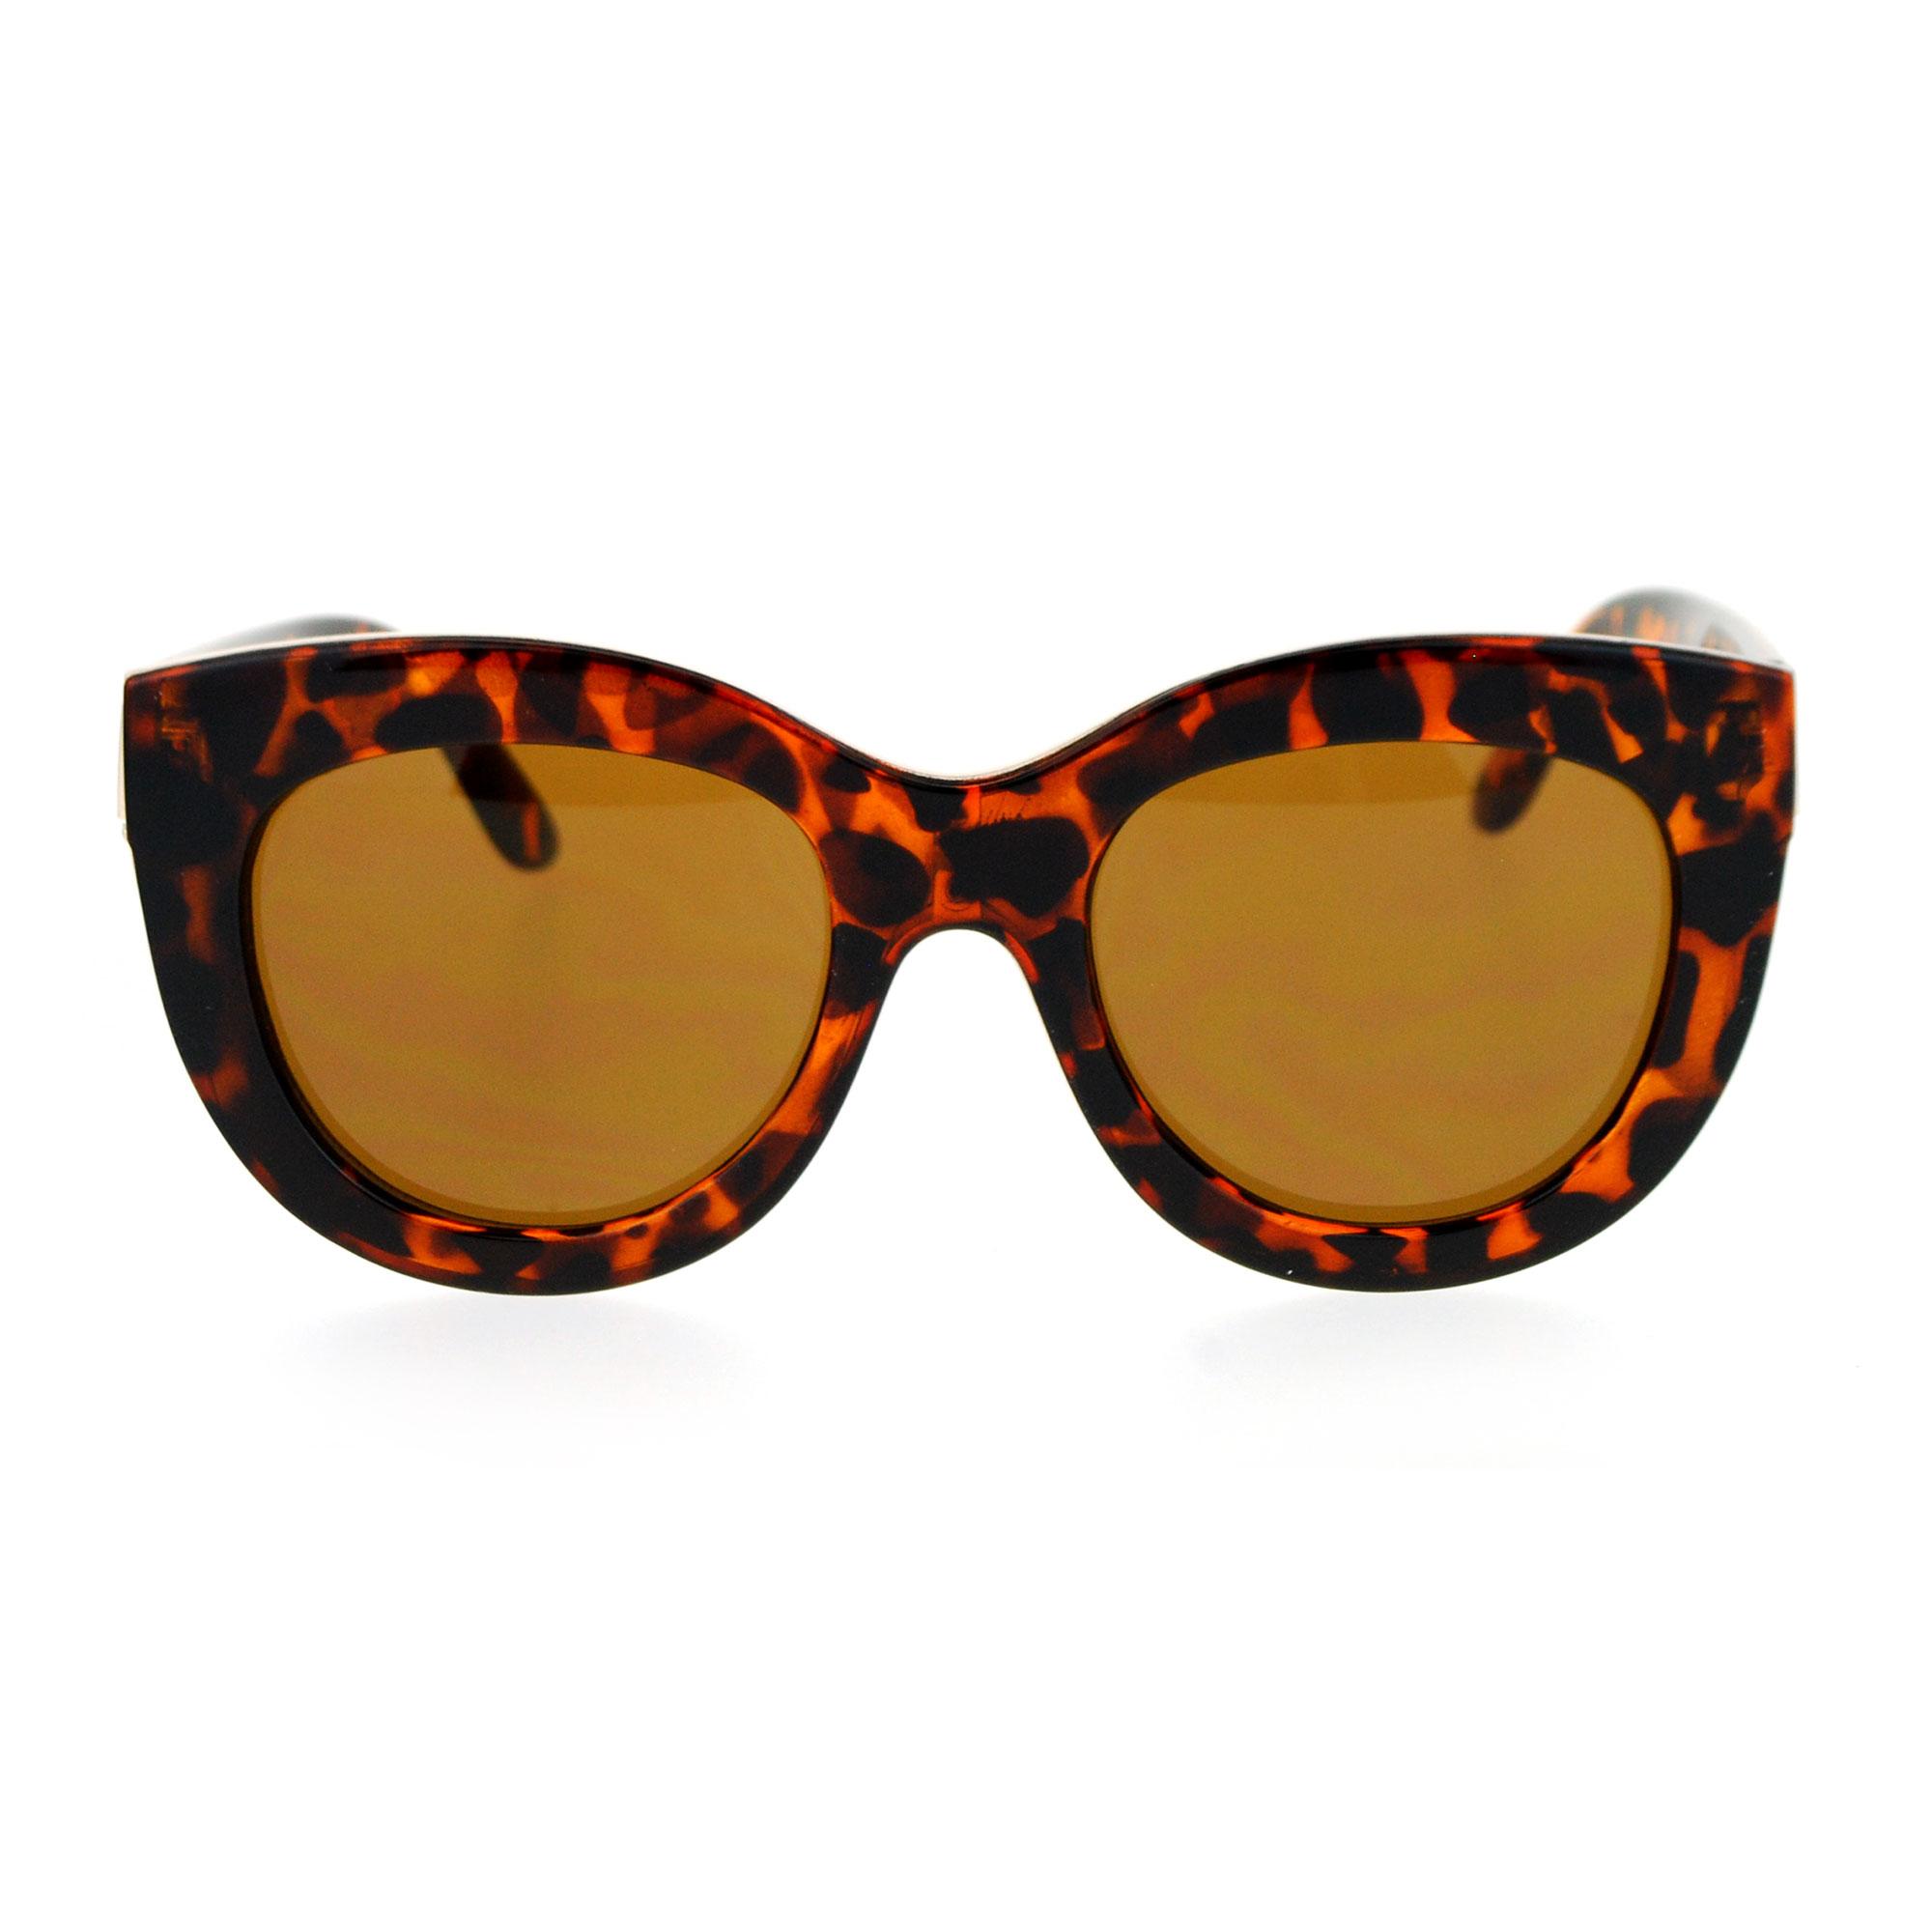 bca923a75c6e Thick Black Cat Eye Glasses